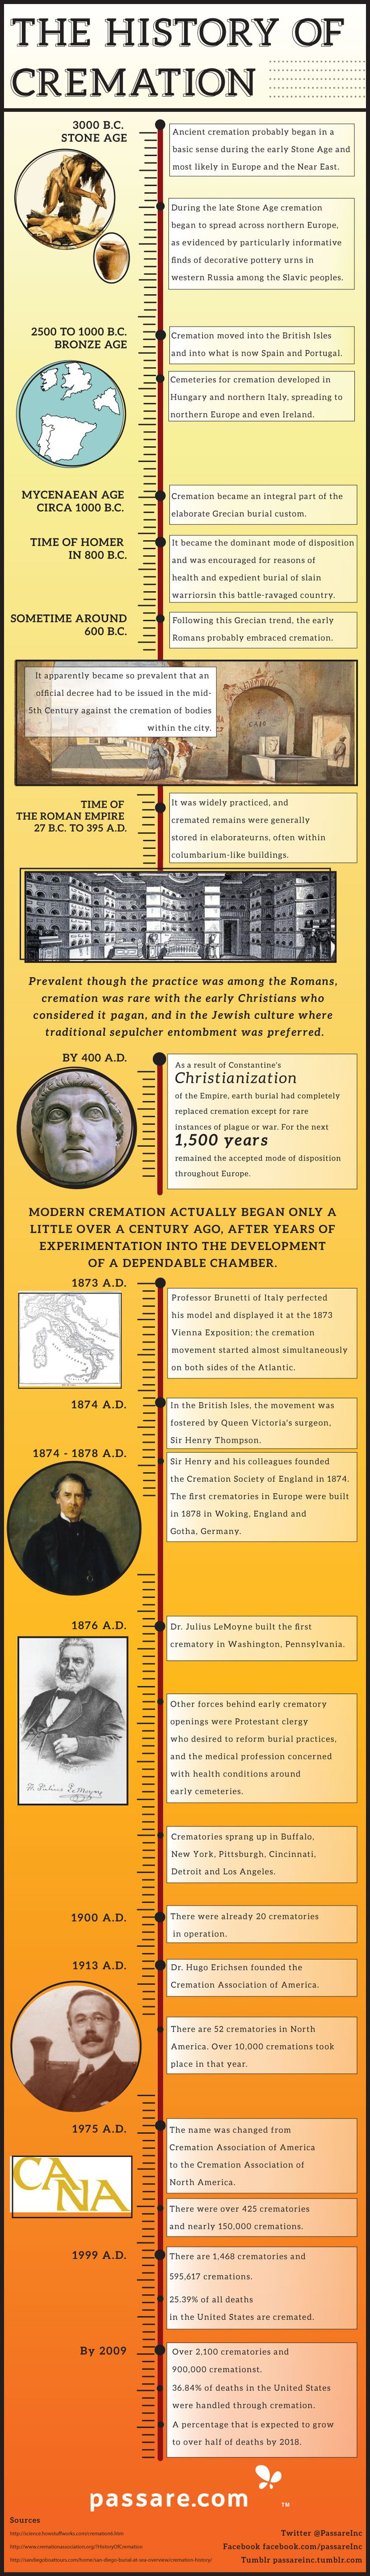 History of #Cremation #Infographic via @passareinc